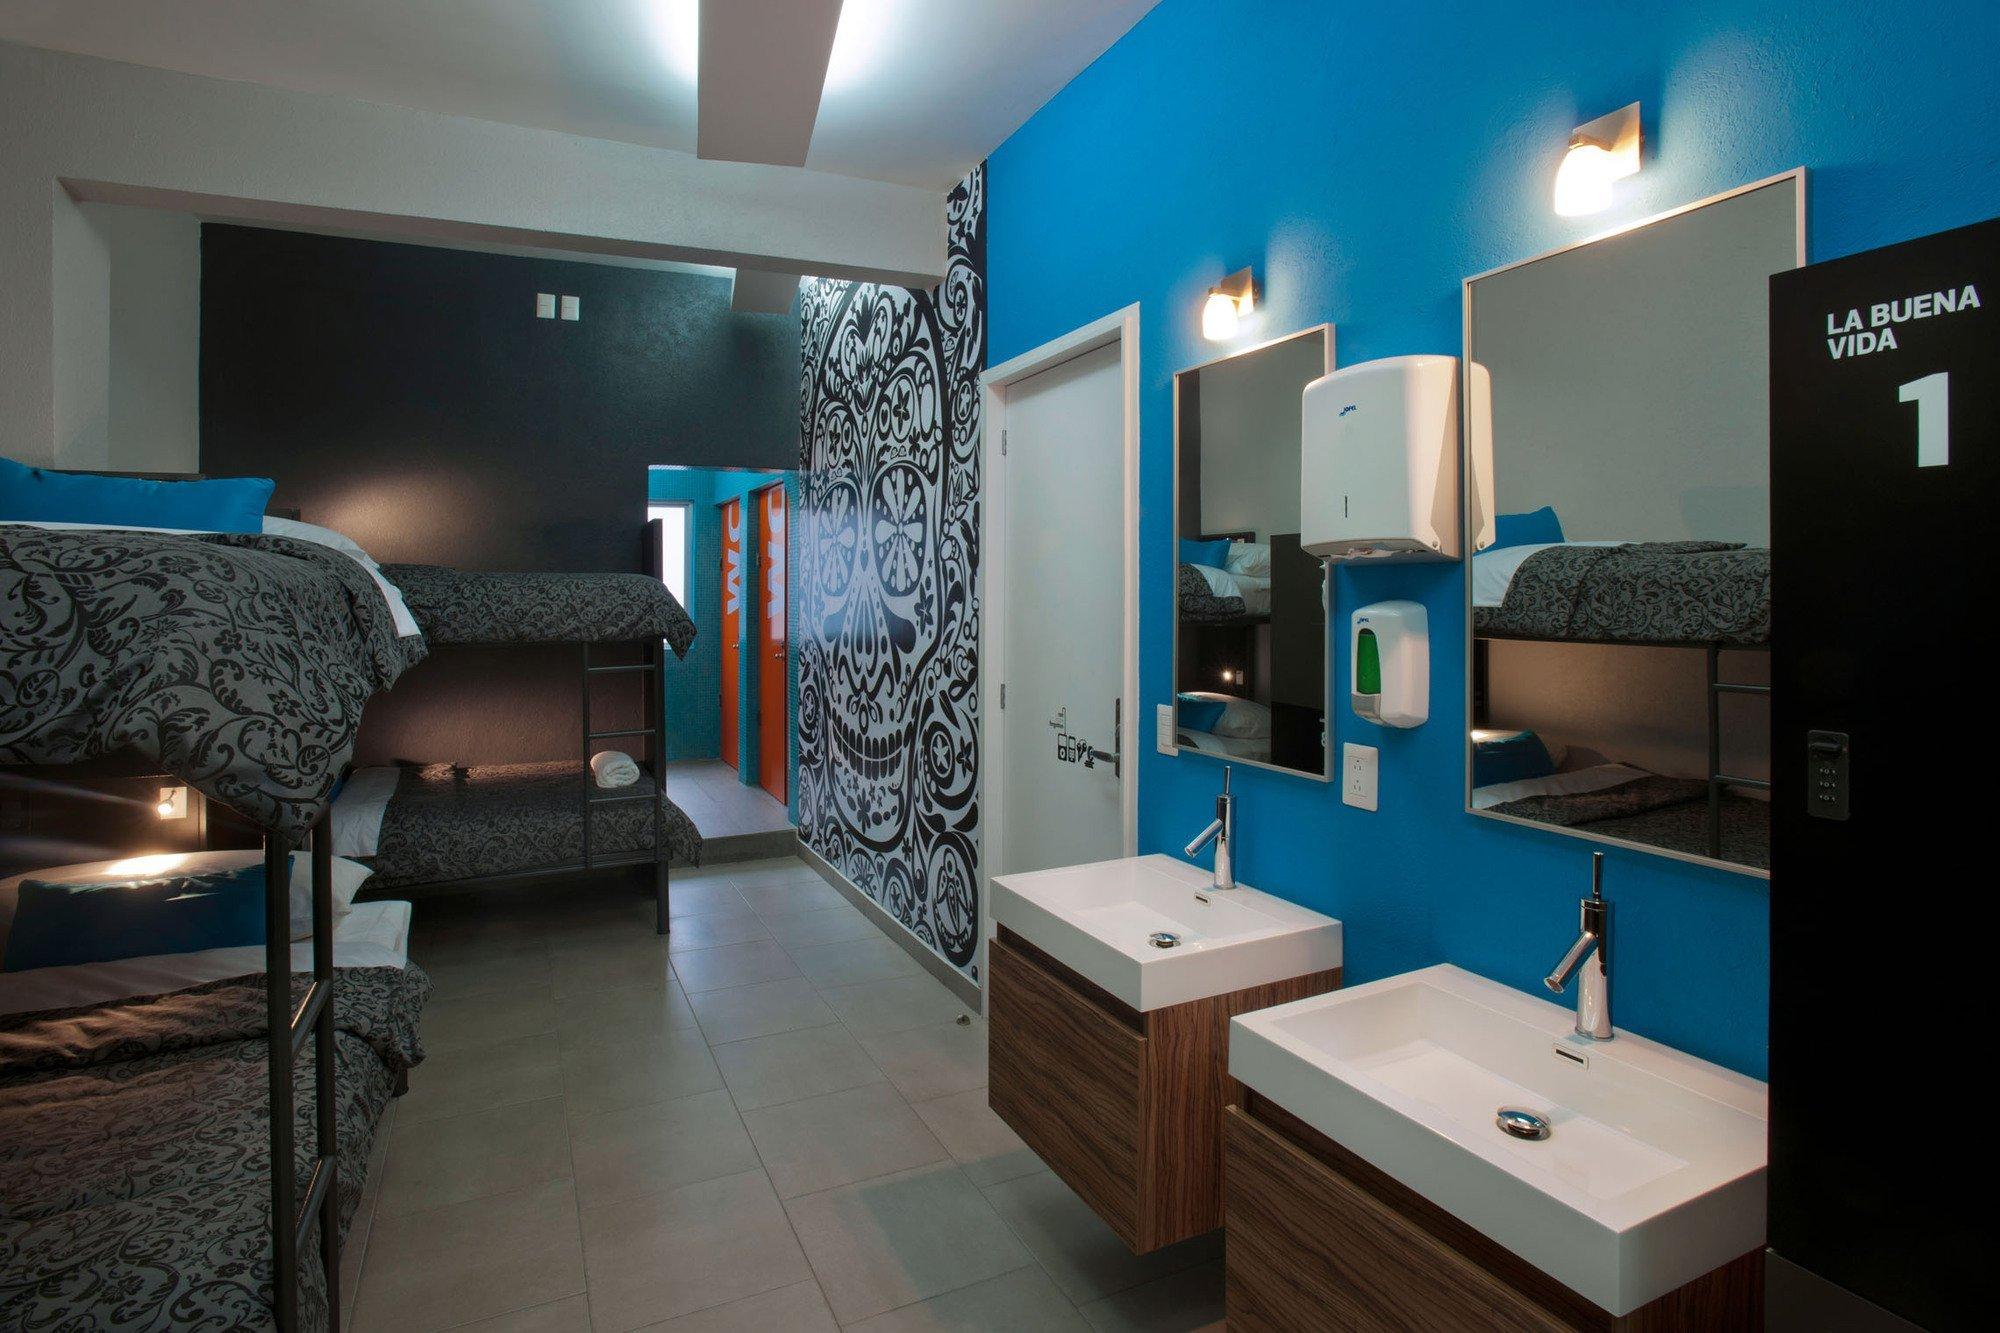 Gallery of hostel la buena vida arco arquitectura for Arquitectura contemporanea